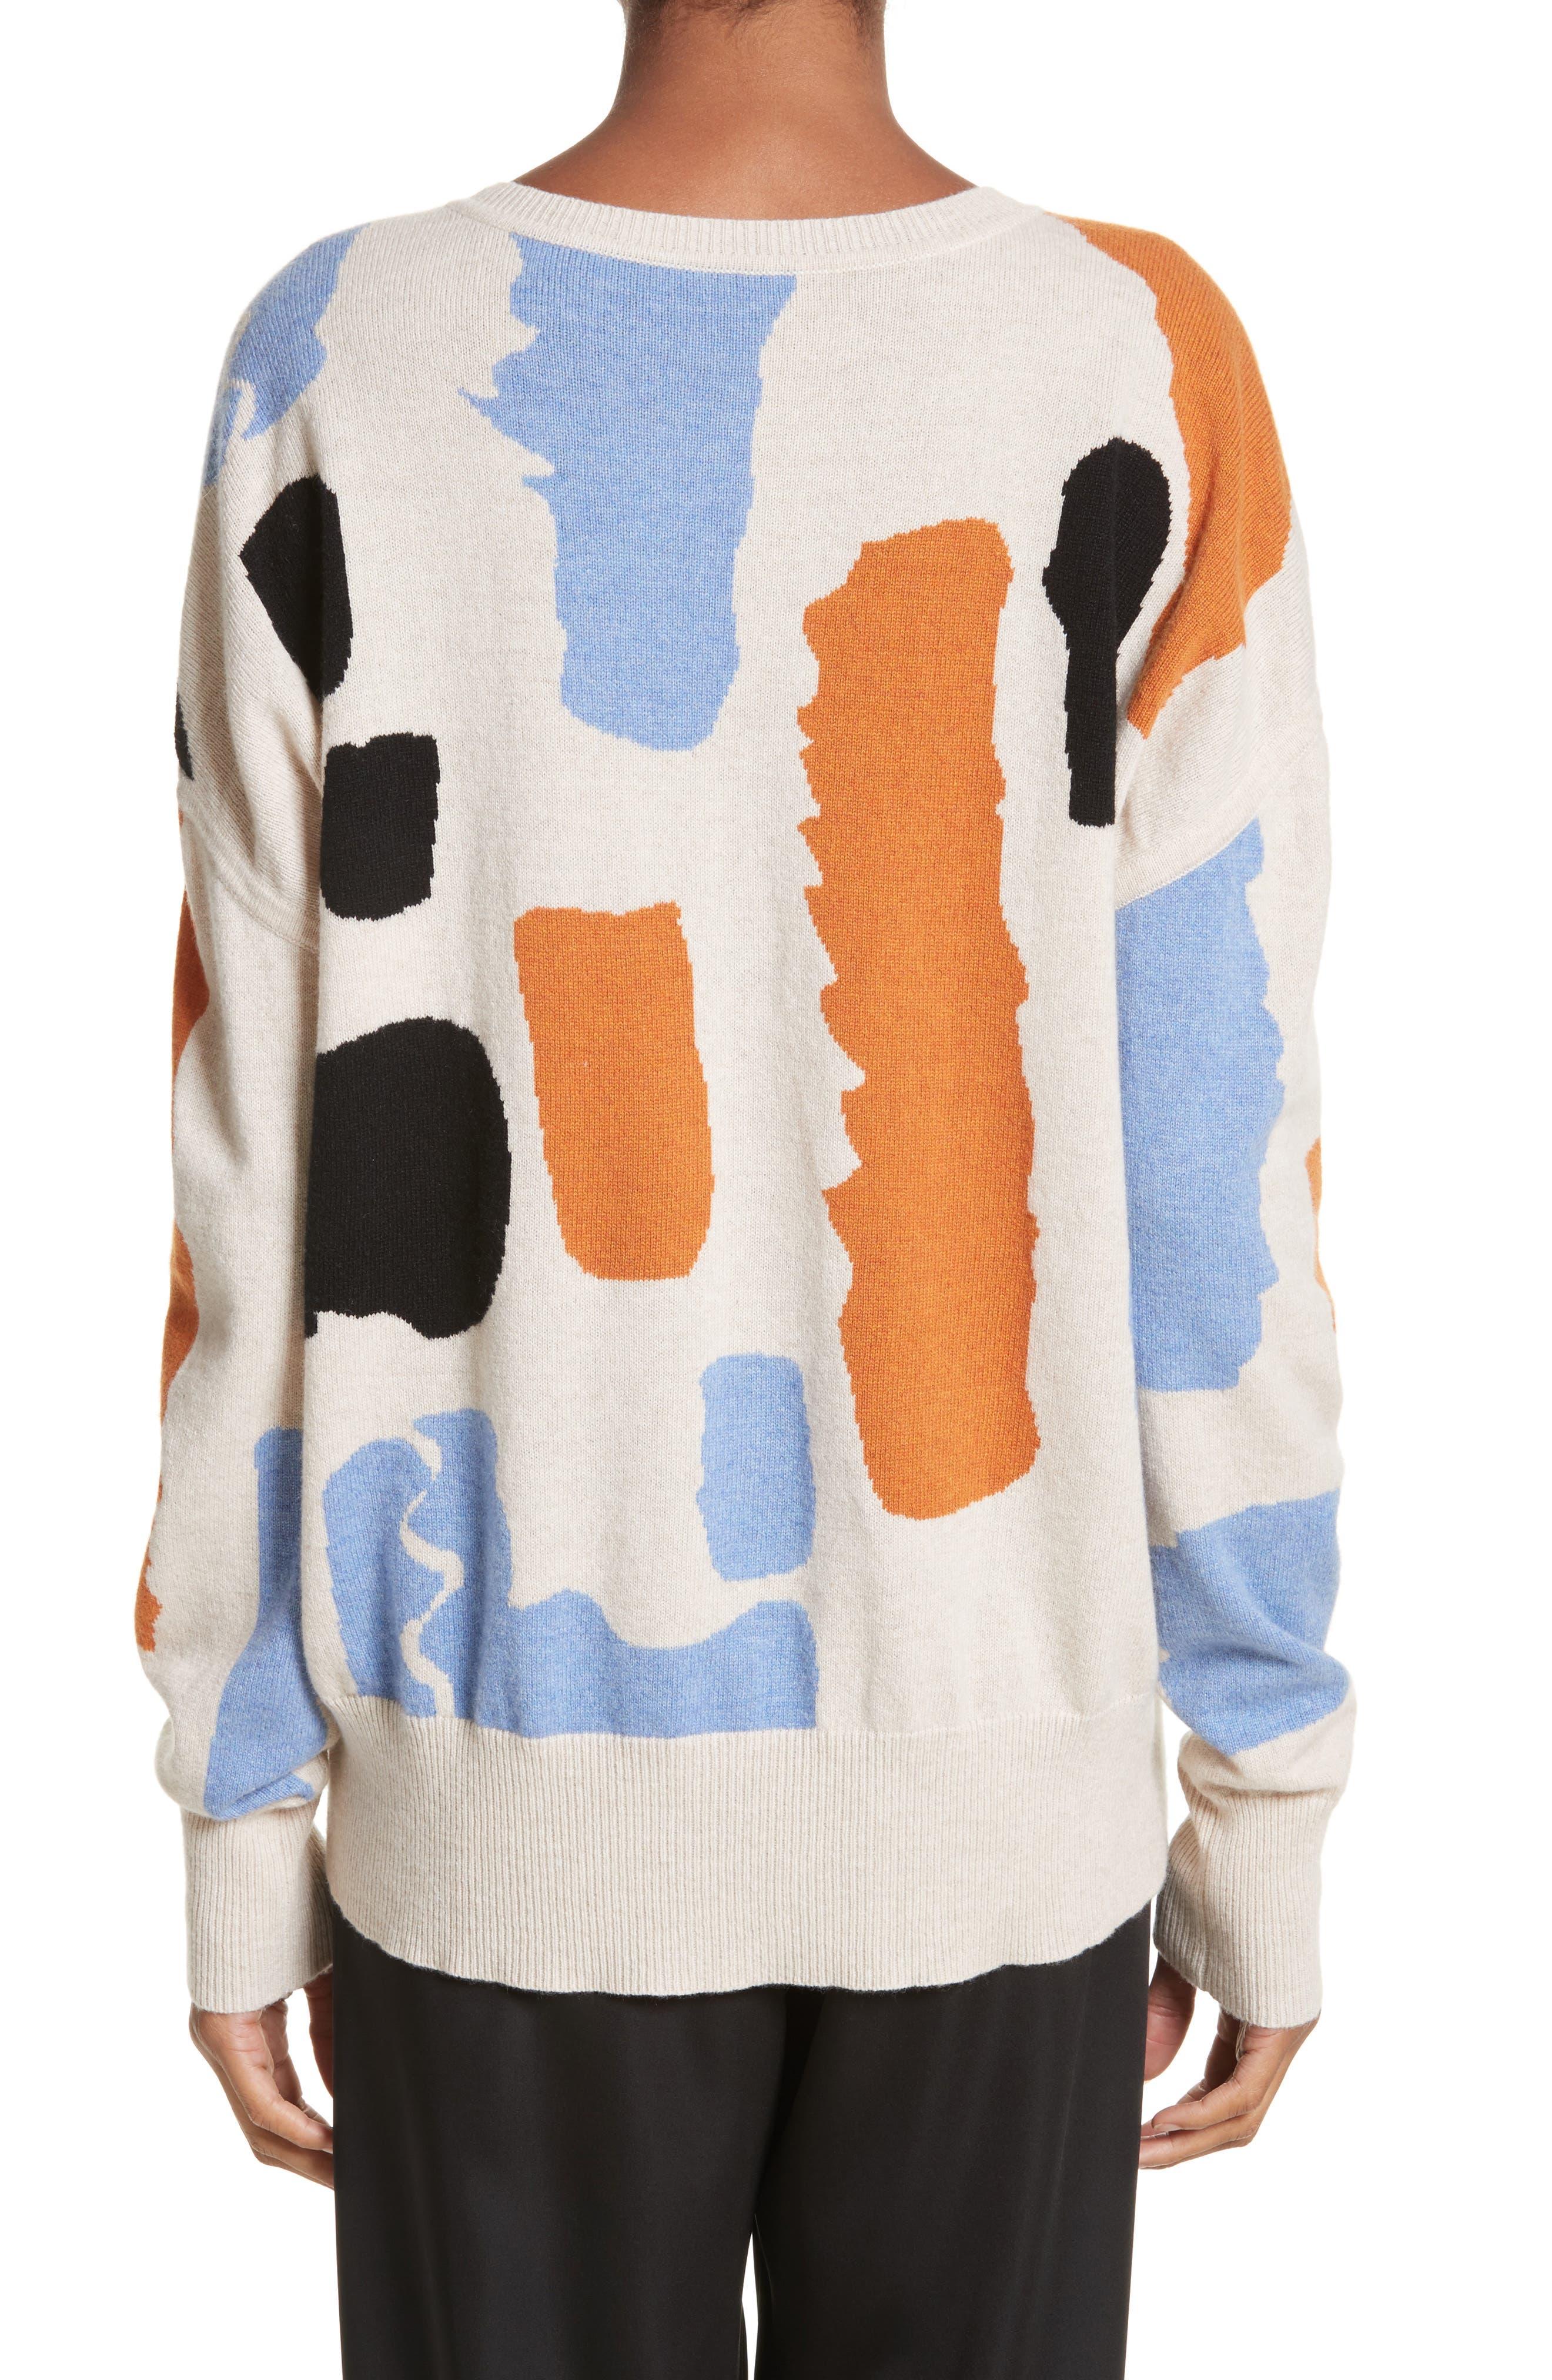 Palette Cashmere & Merino Wool Sweater,                             Alternate thumbnail 2, color,                             Palette Greige